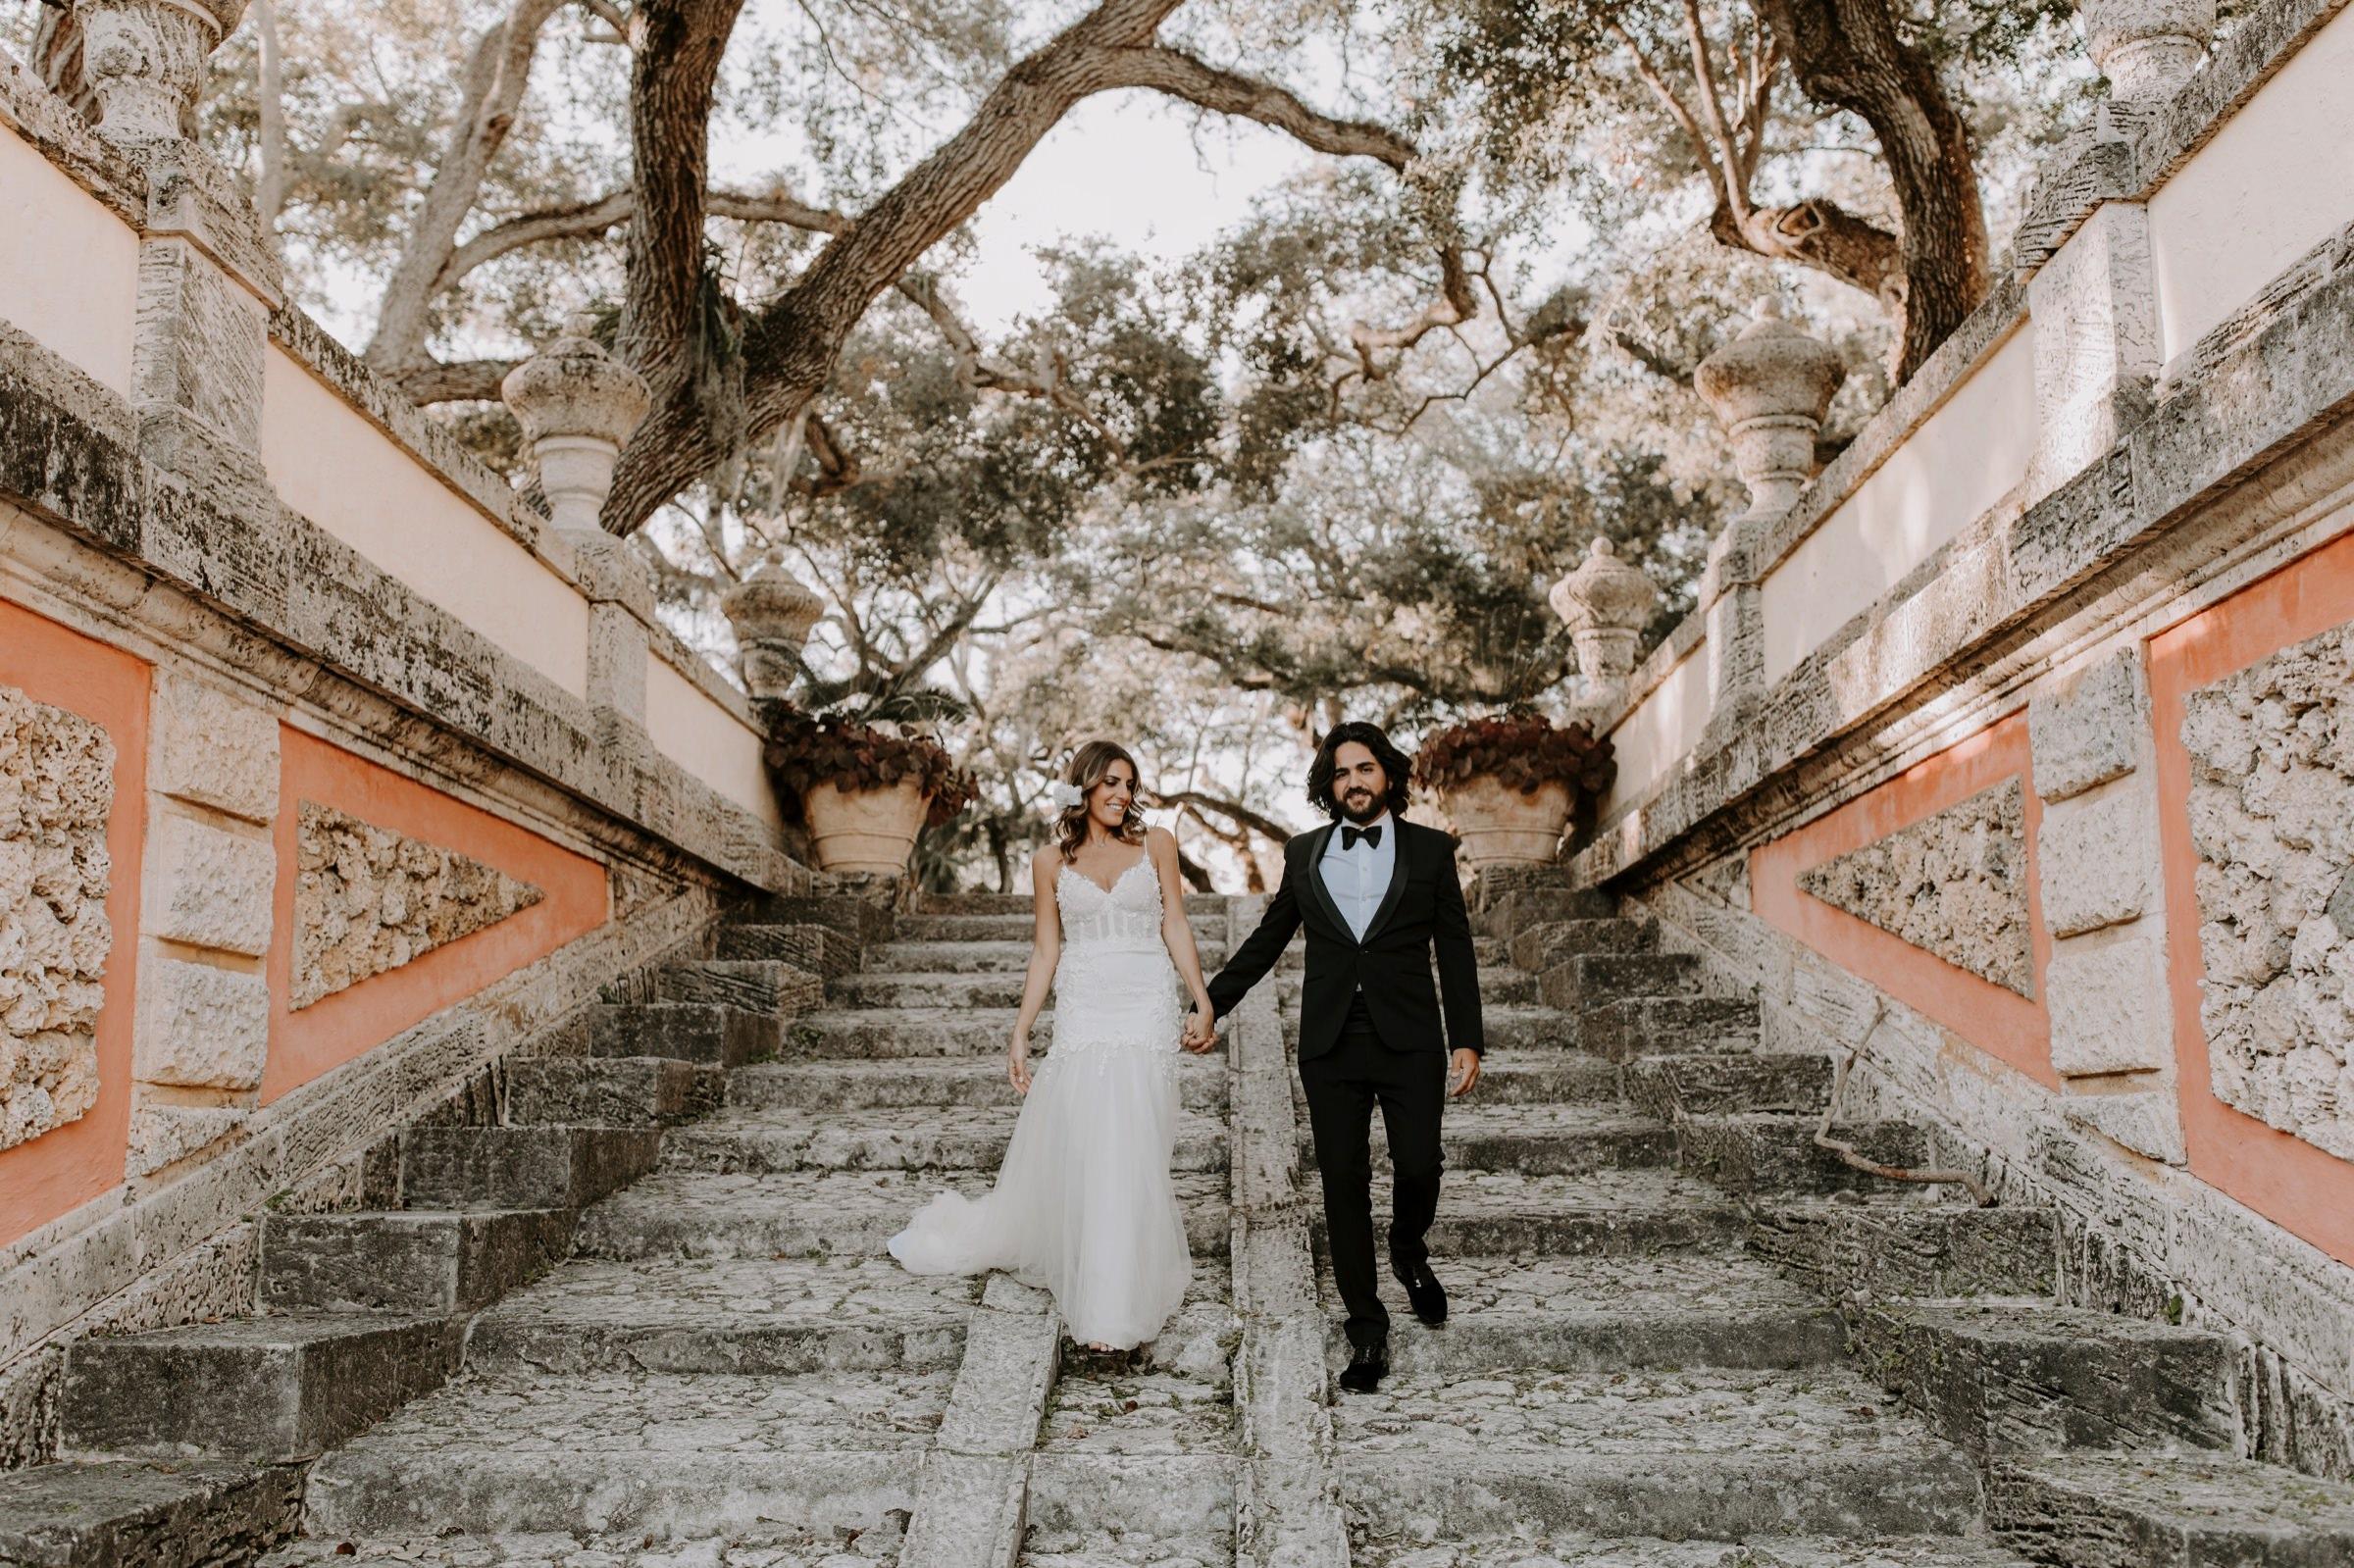 Wedding Portraits at Vizcaya